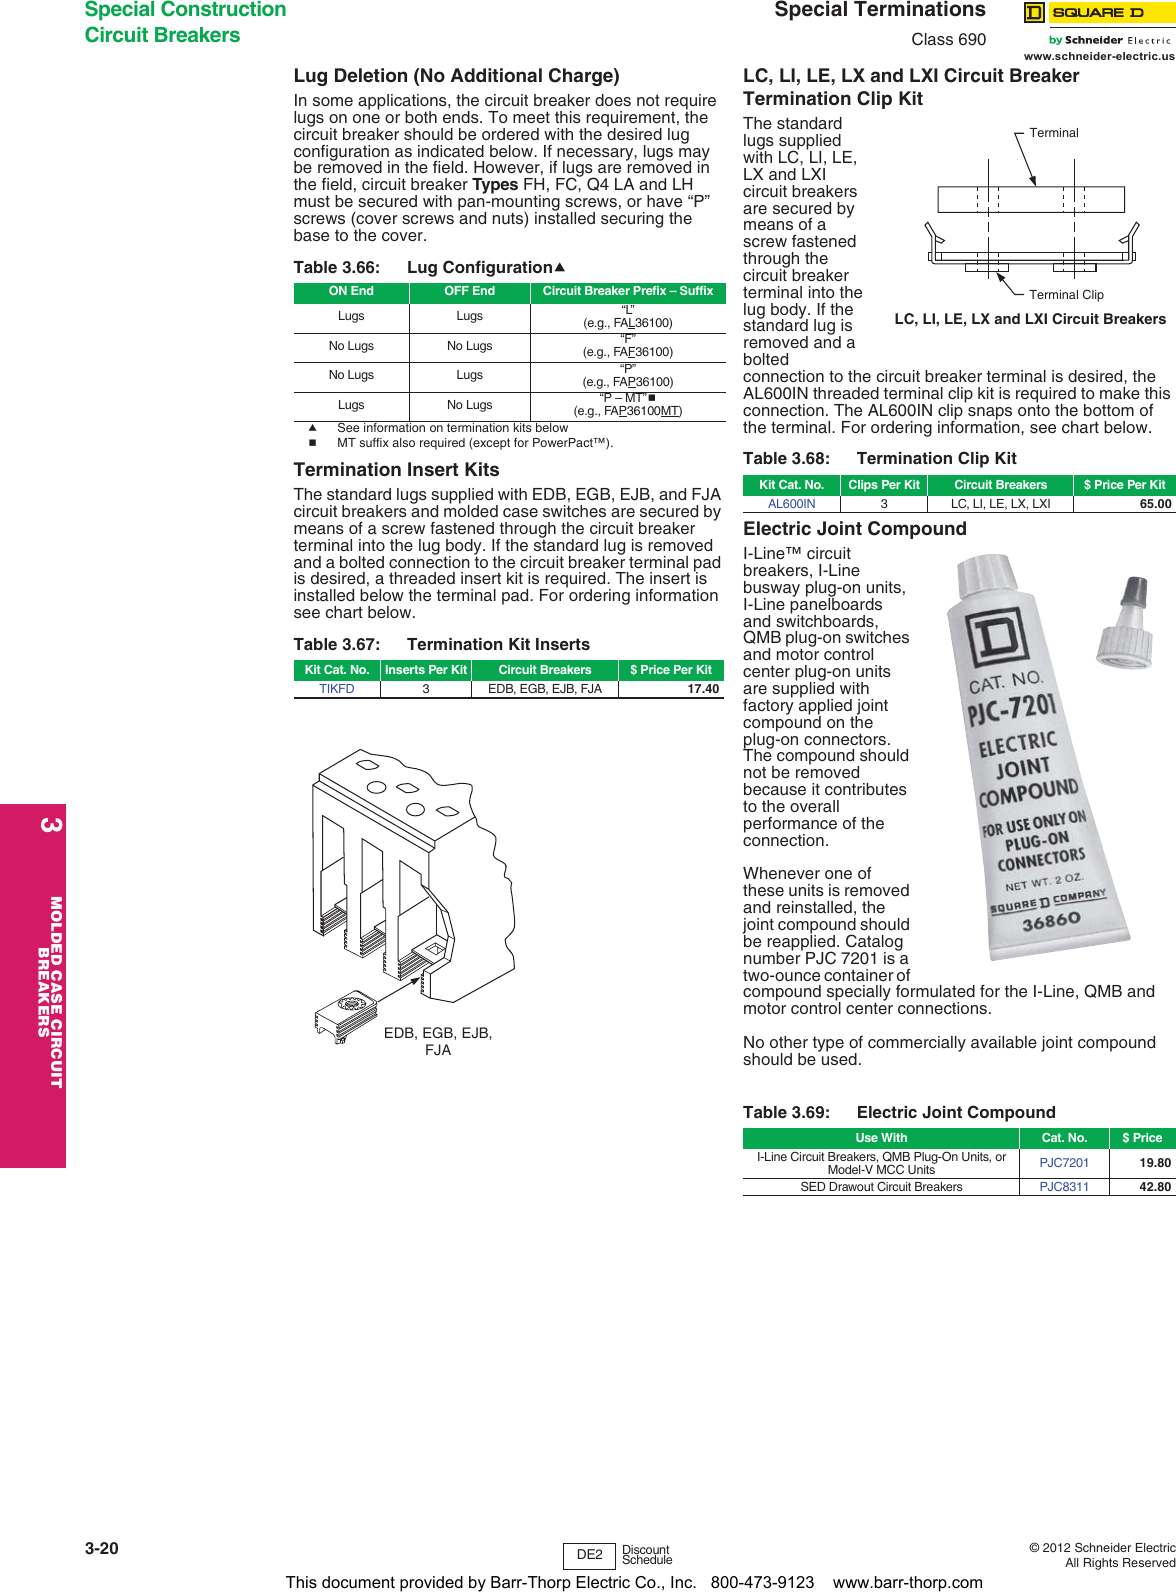 BRAND NEW QOXD363 SCHNEIDER ELECTRIC QOXD363